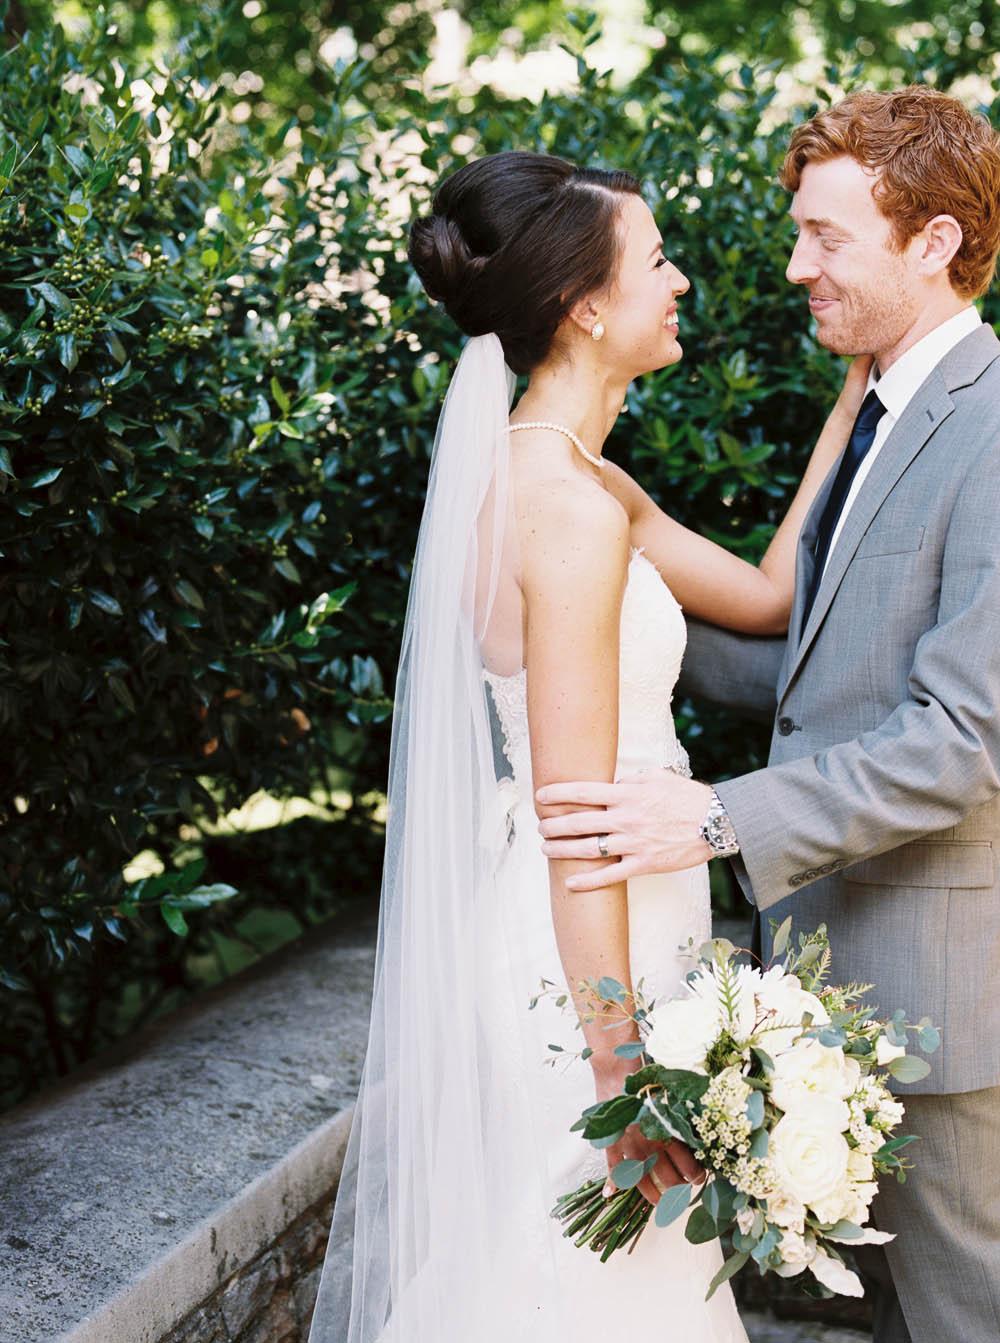 scarritt bennett film wedding photographers documentary natural classic ©2016abigailbobophotography0054.jpg